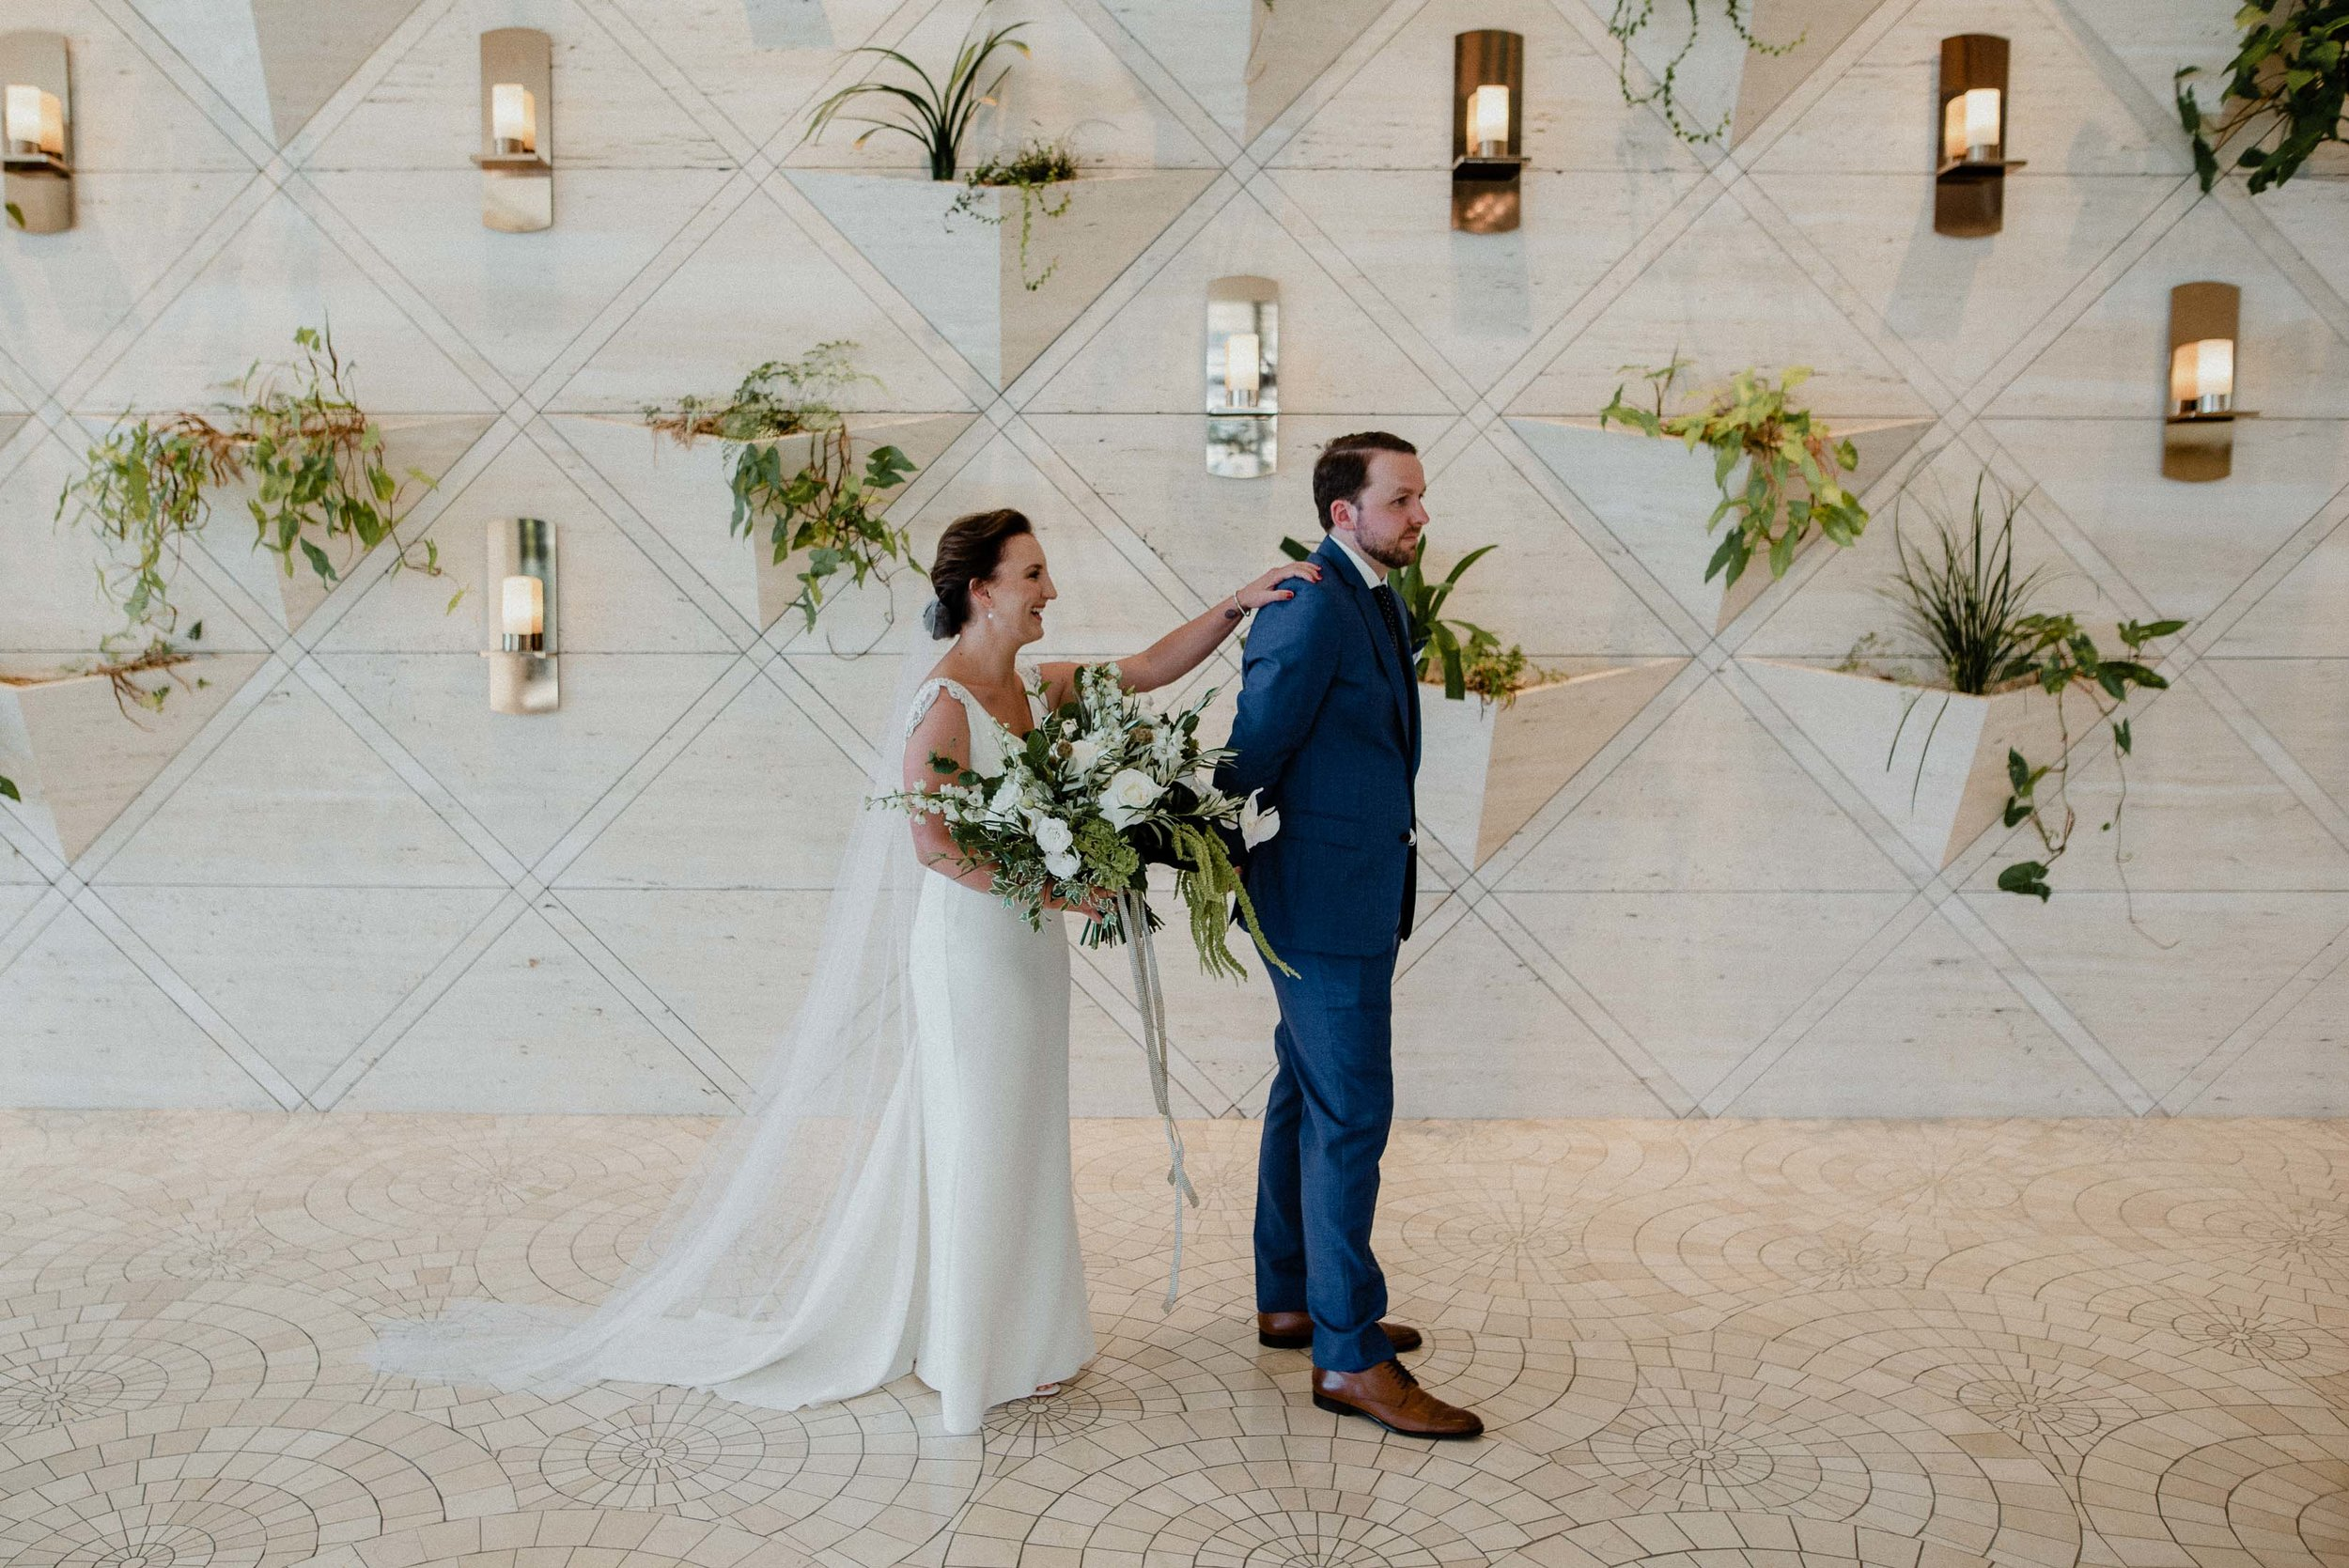 lauren-rodger-lamonts-bishops-perth-wedding-1.JPG